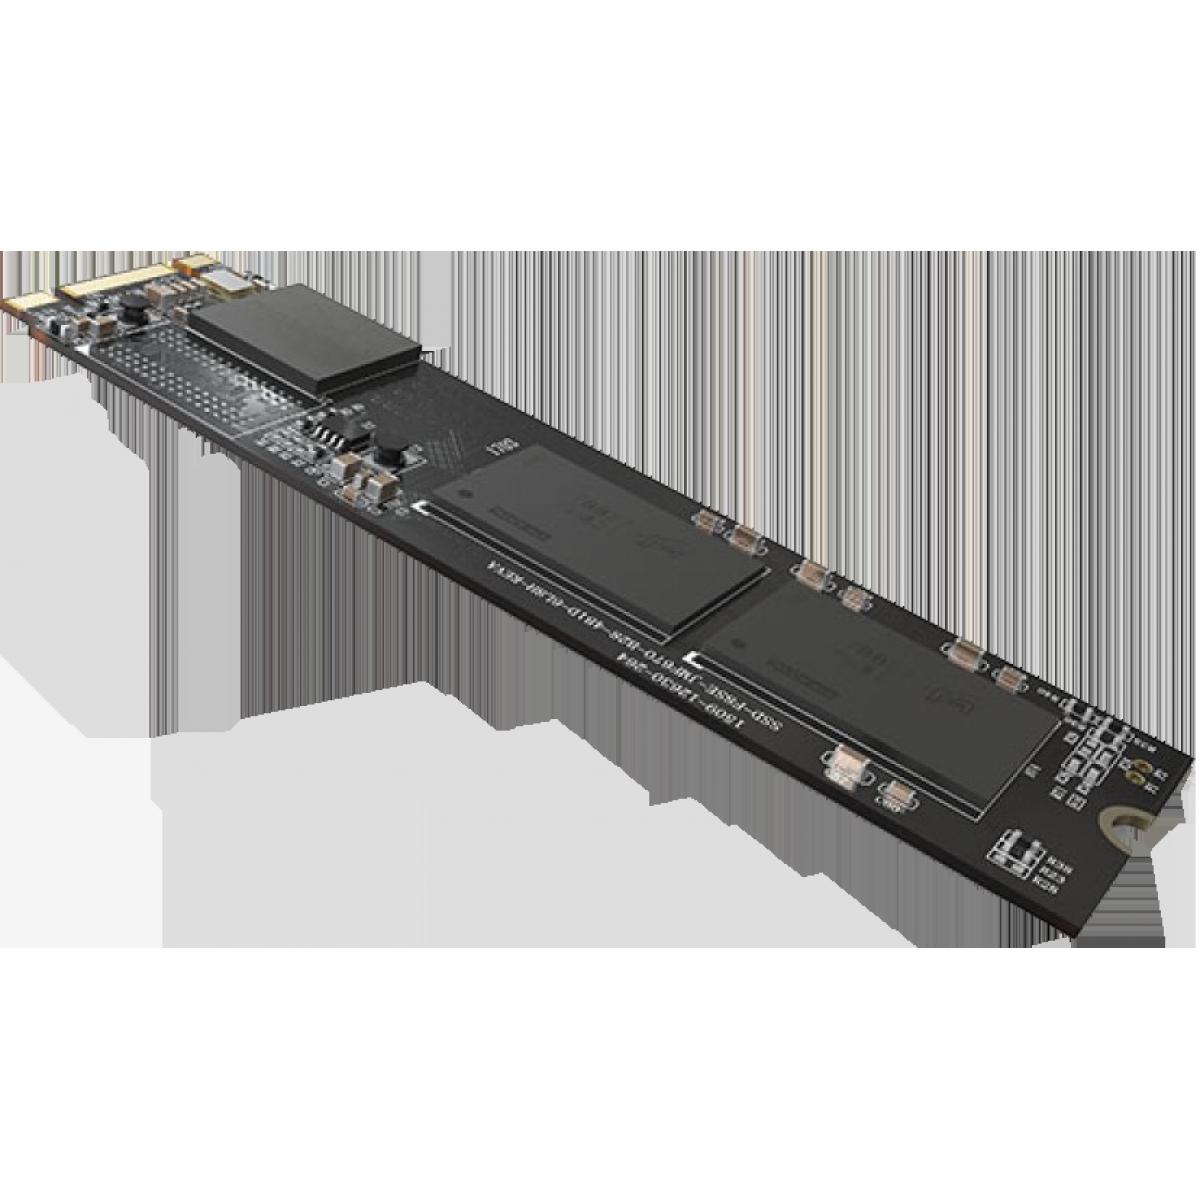 SSD Hikvision E100N 512GB, M.2 2280, Leitura 550MBs e Gravação 510MBs, HS-SSD-E100N(STD)/512G